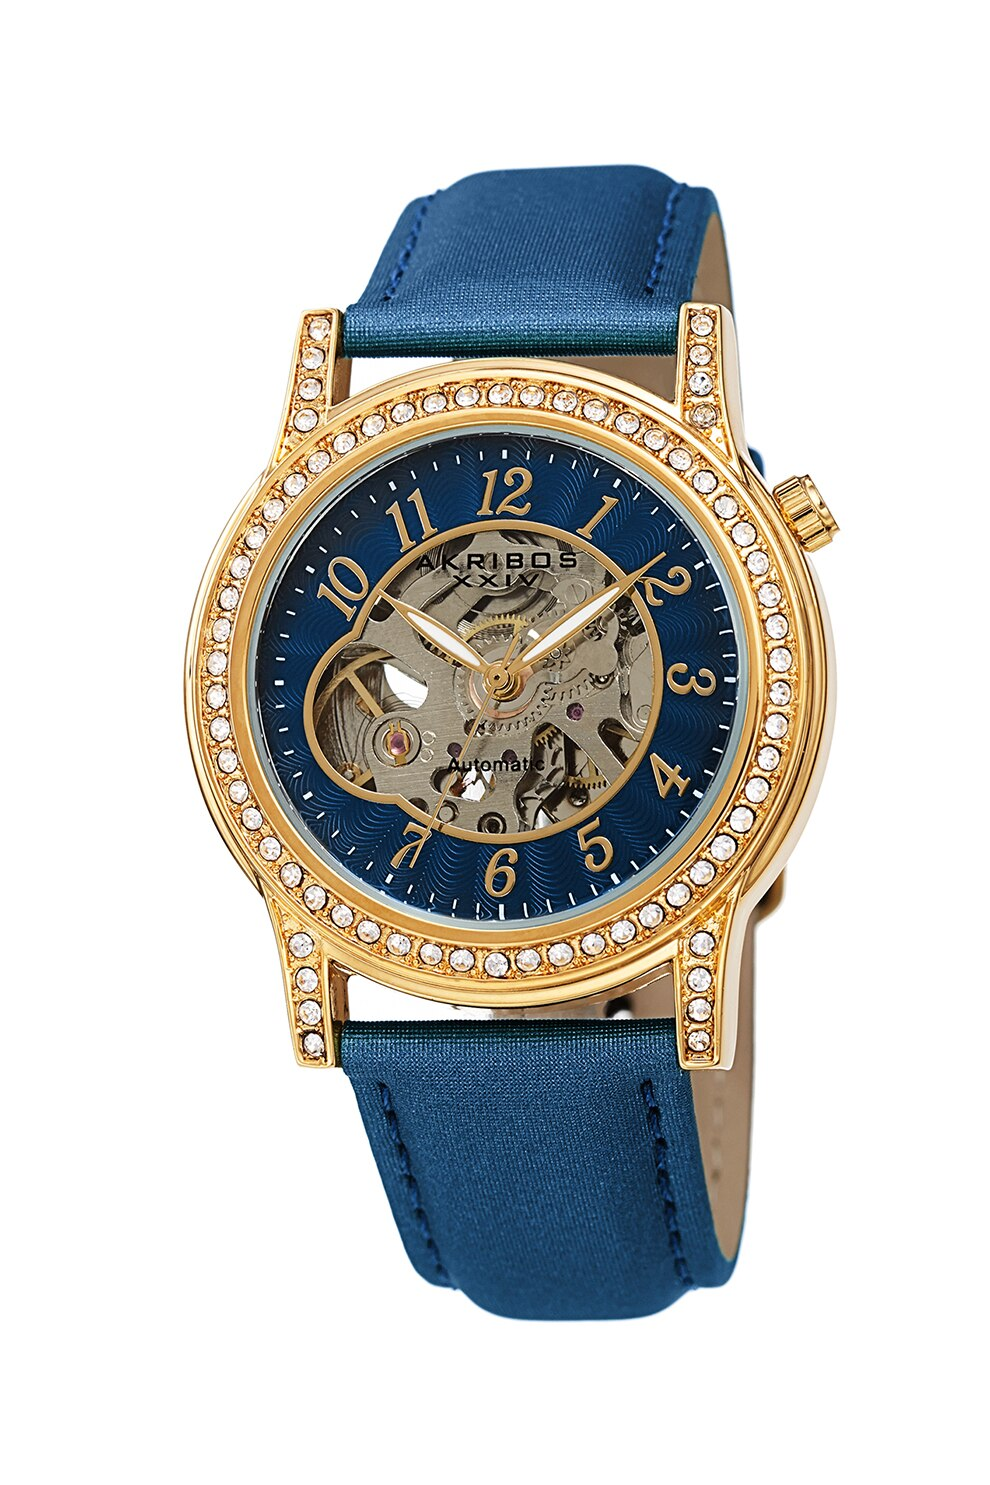 Fotografie AKRIBOS XXIV, Ceas automatic cu cadran cu mecanism vizibil, Albastru inchis/Auriu